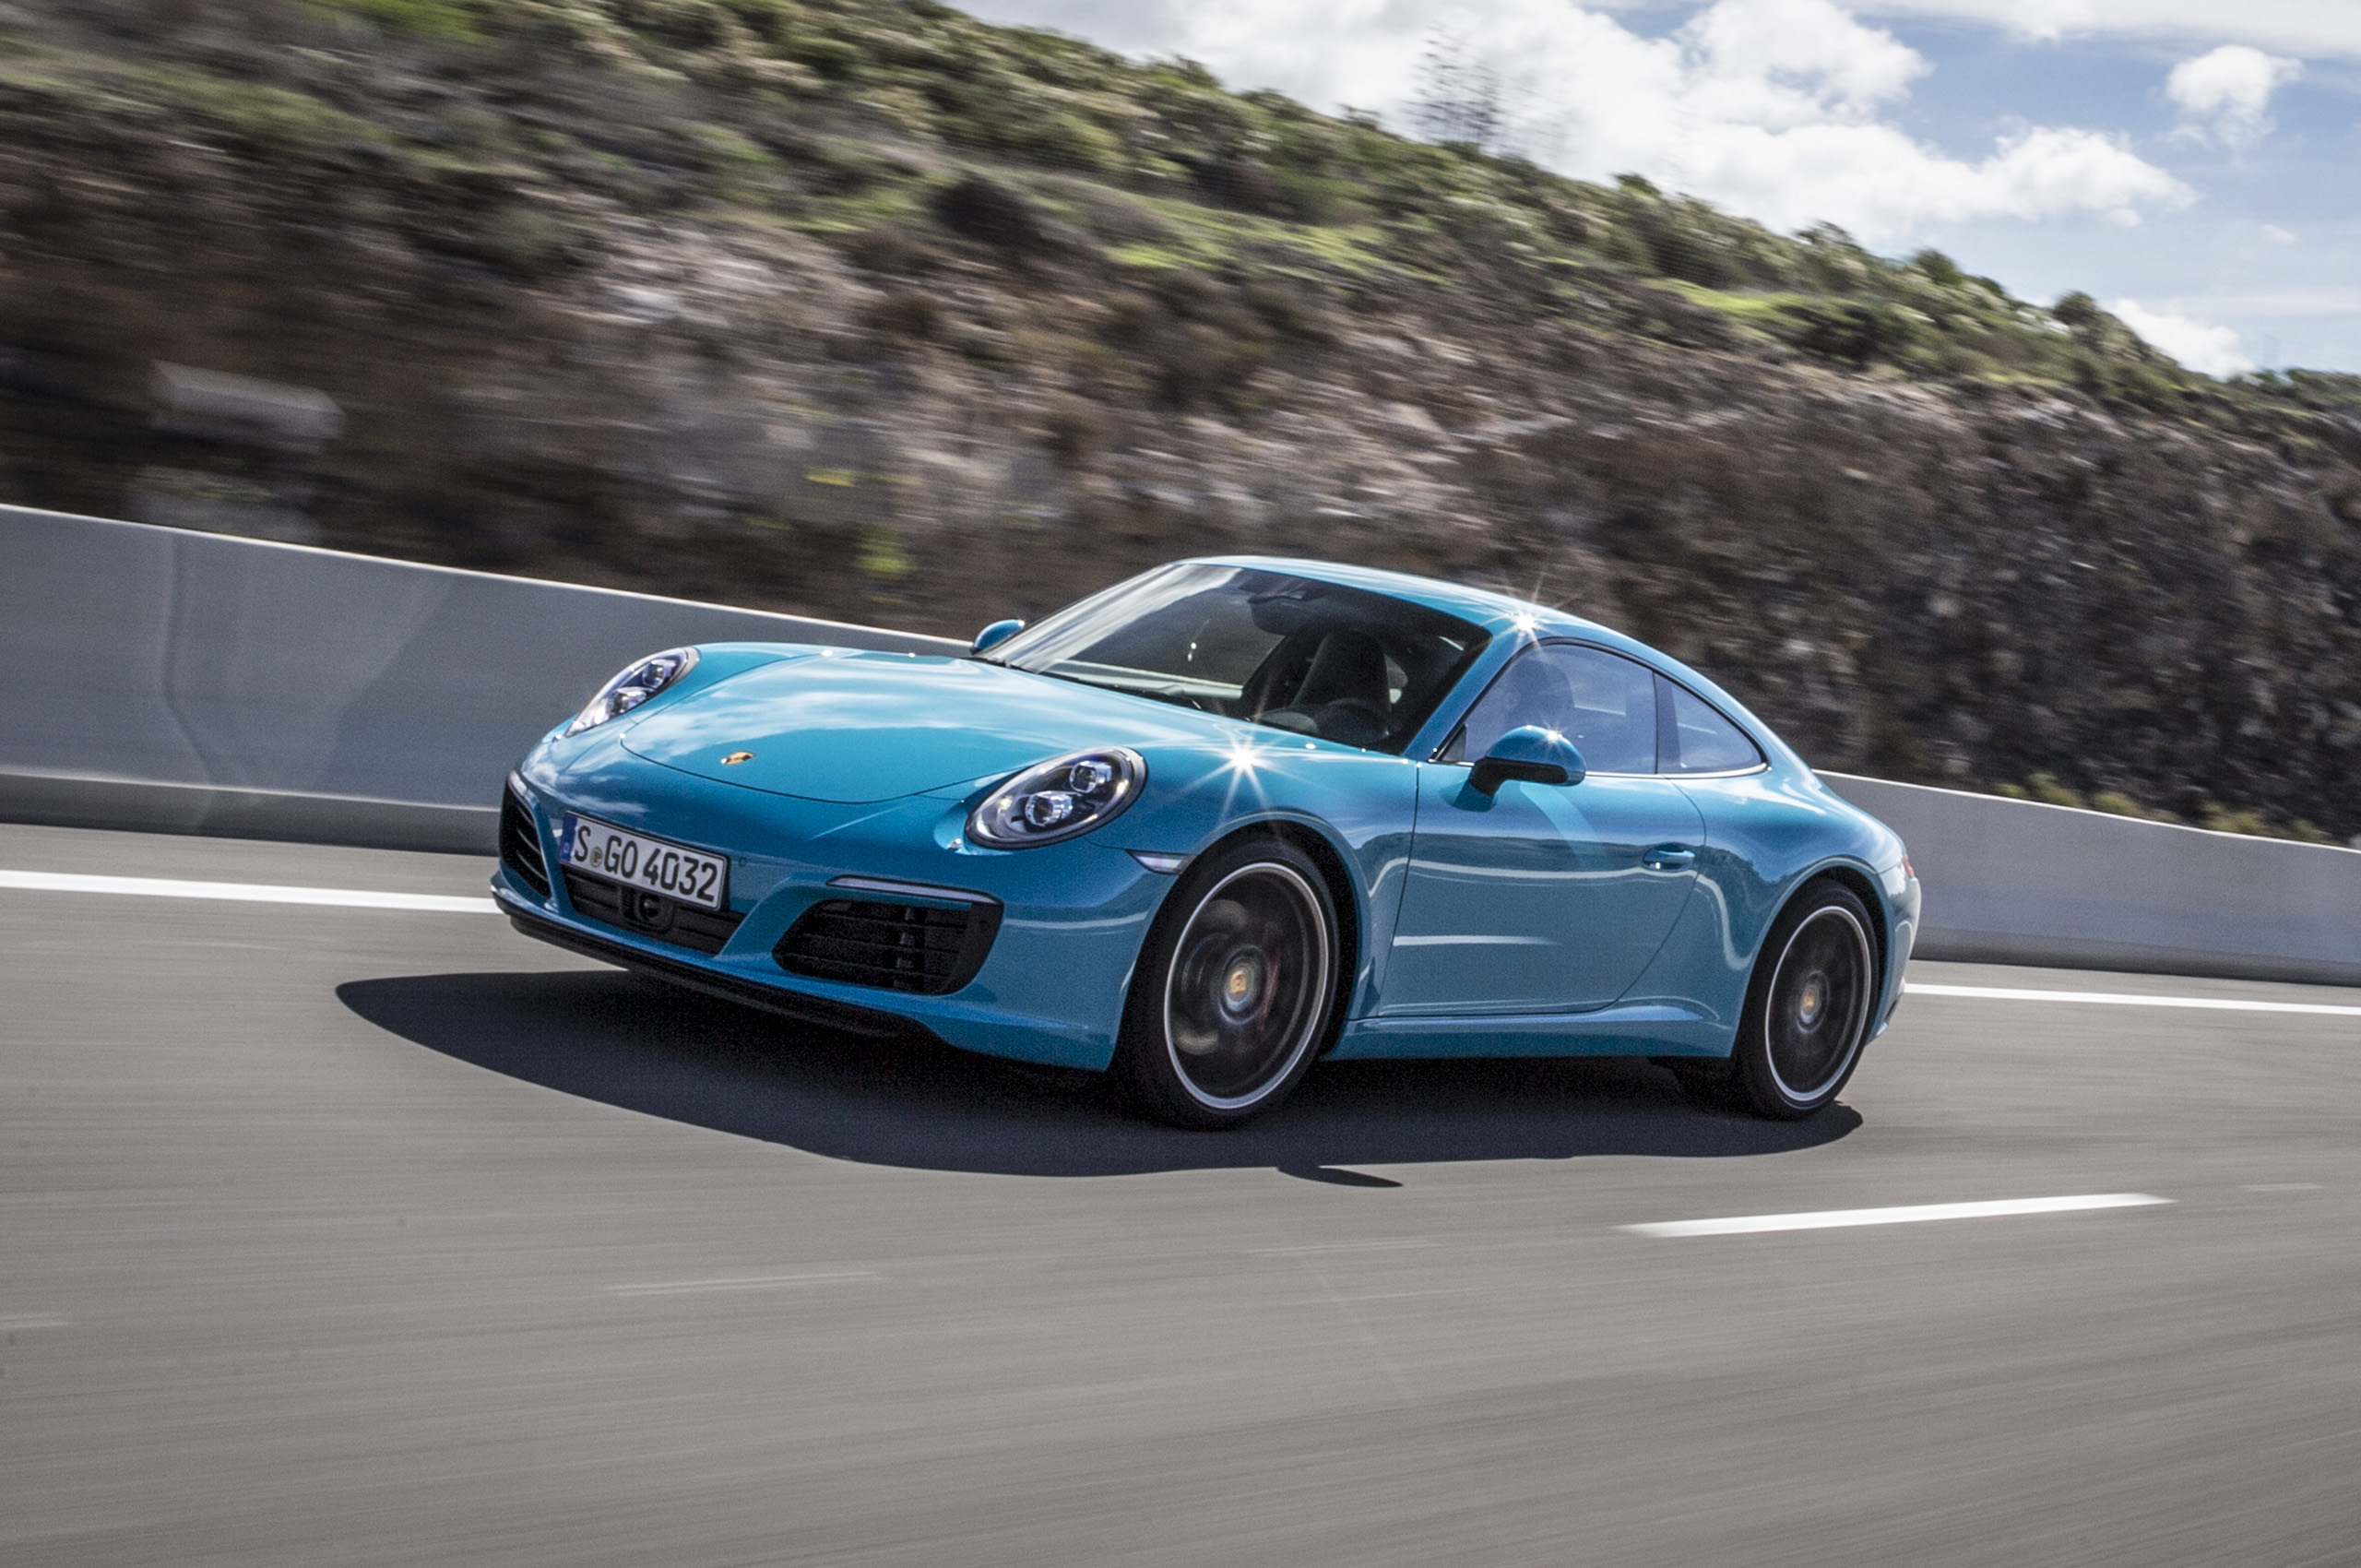 Porsche Carrera S >> 2016 Porsche 911 Carrera S Review Review Autocar